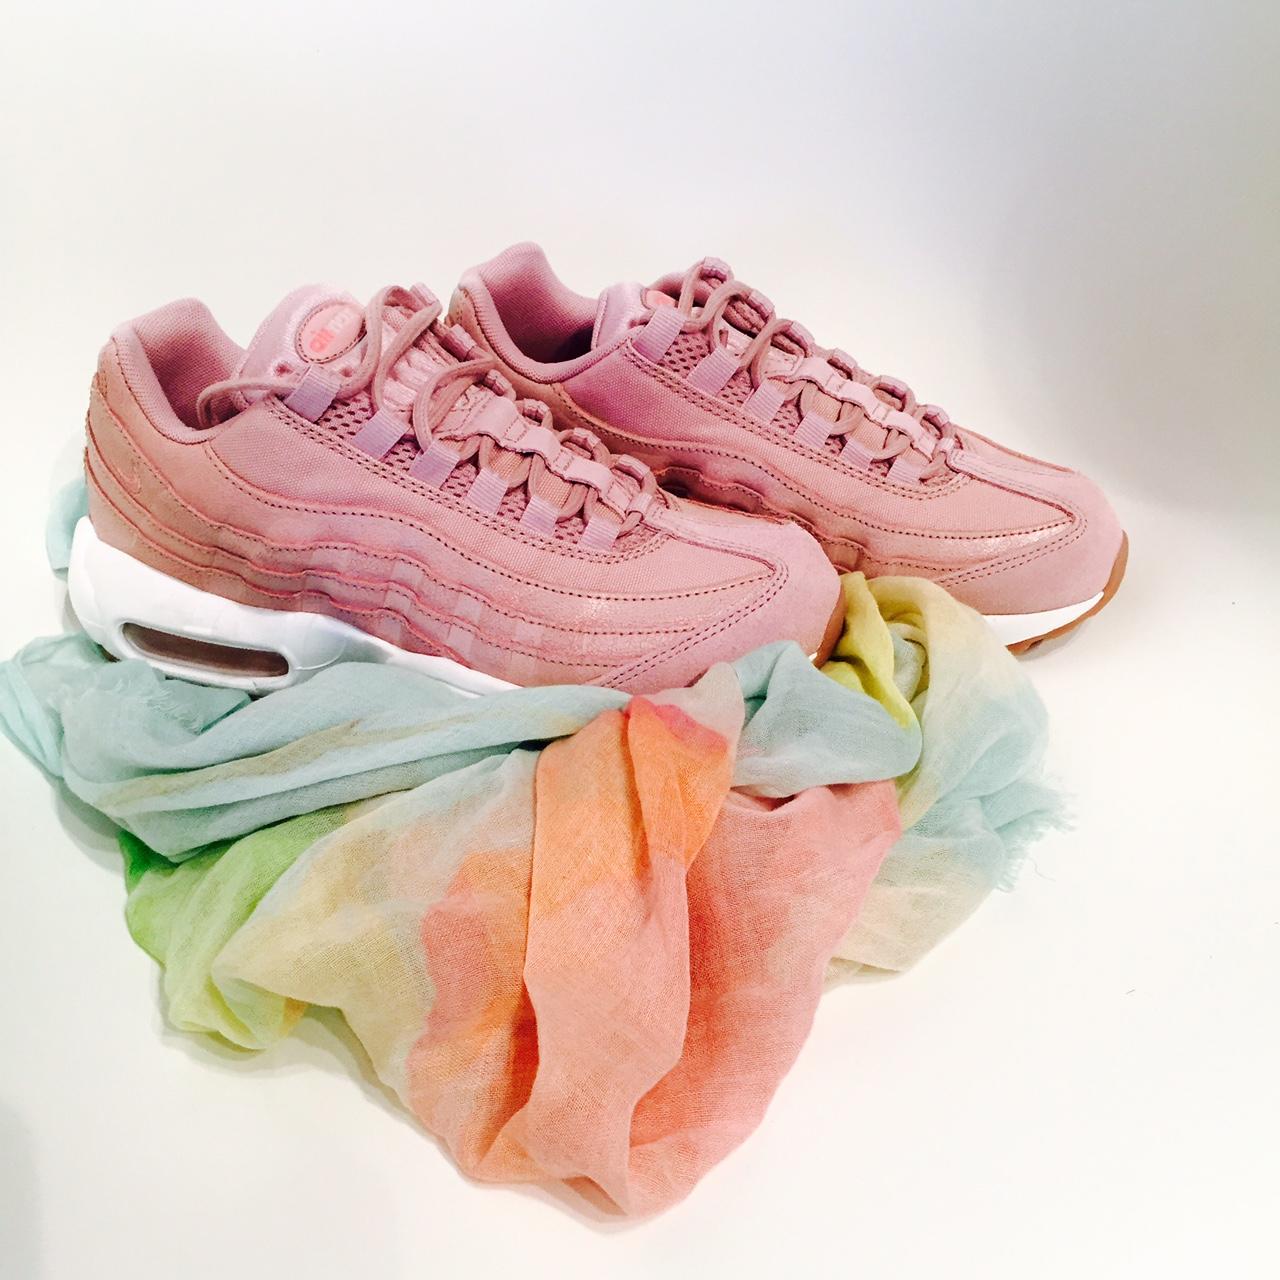 sneakerscarf